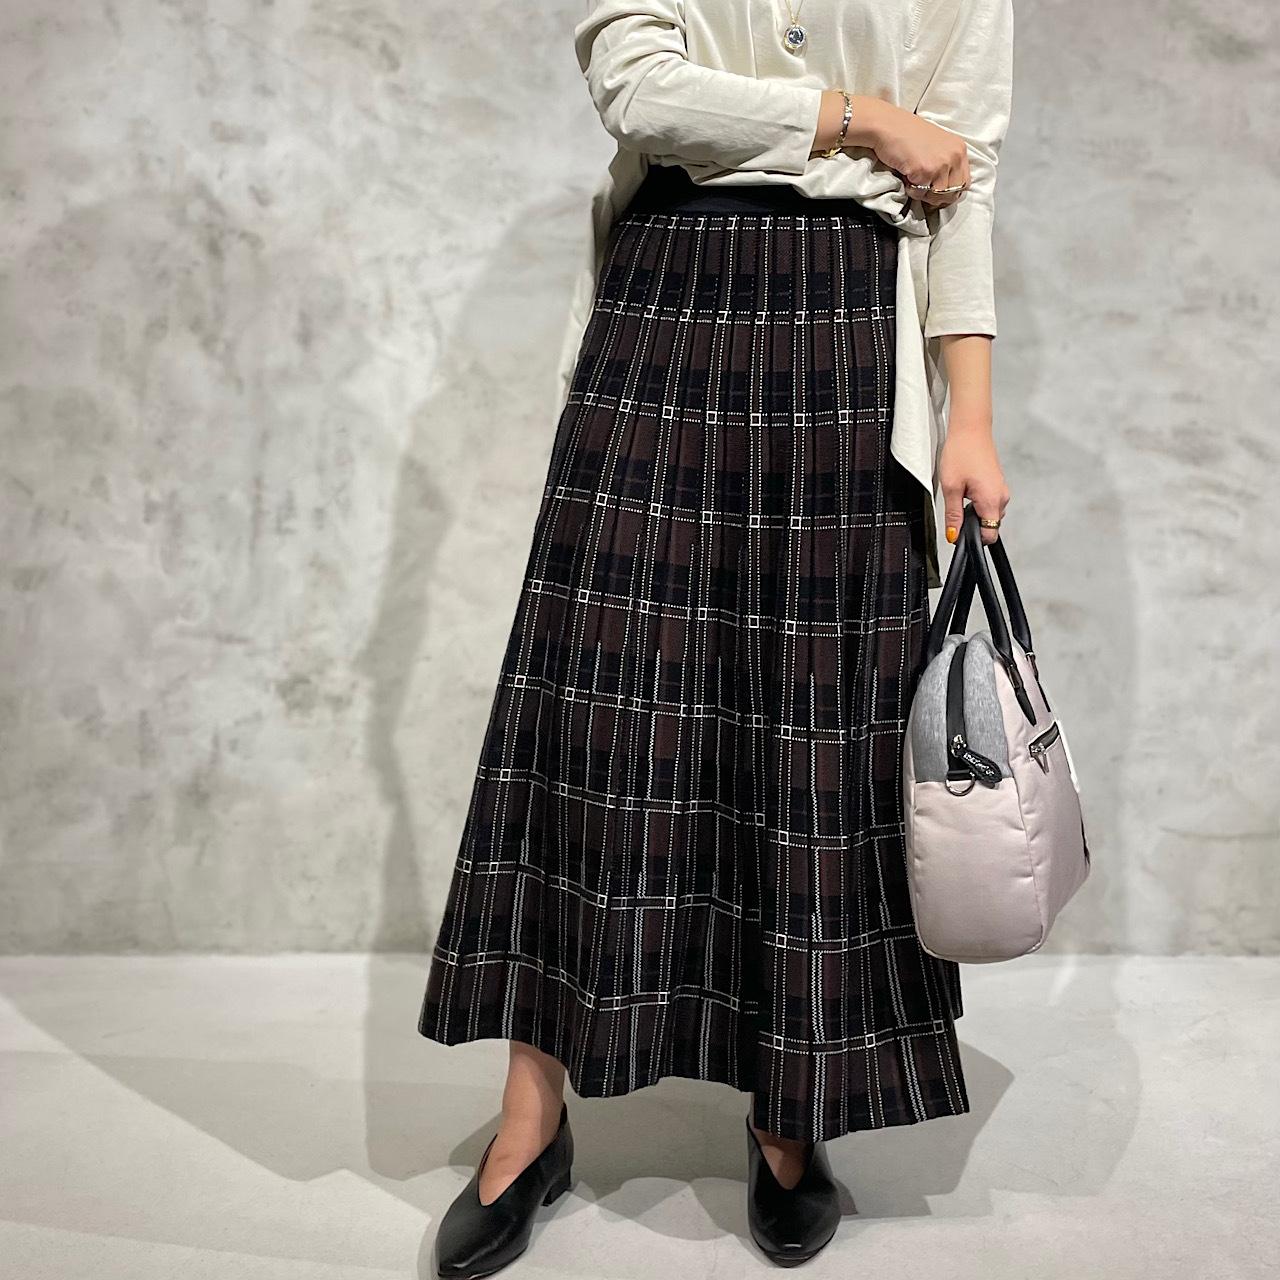 TORRAZZO DONNA/トラッツォドンナ 2WAYリバーシブルチェックニットスカート 6215-582